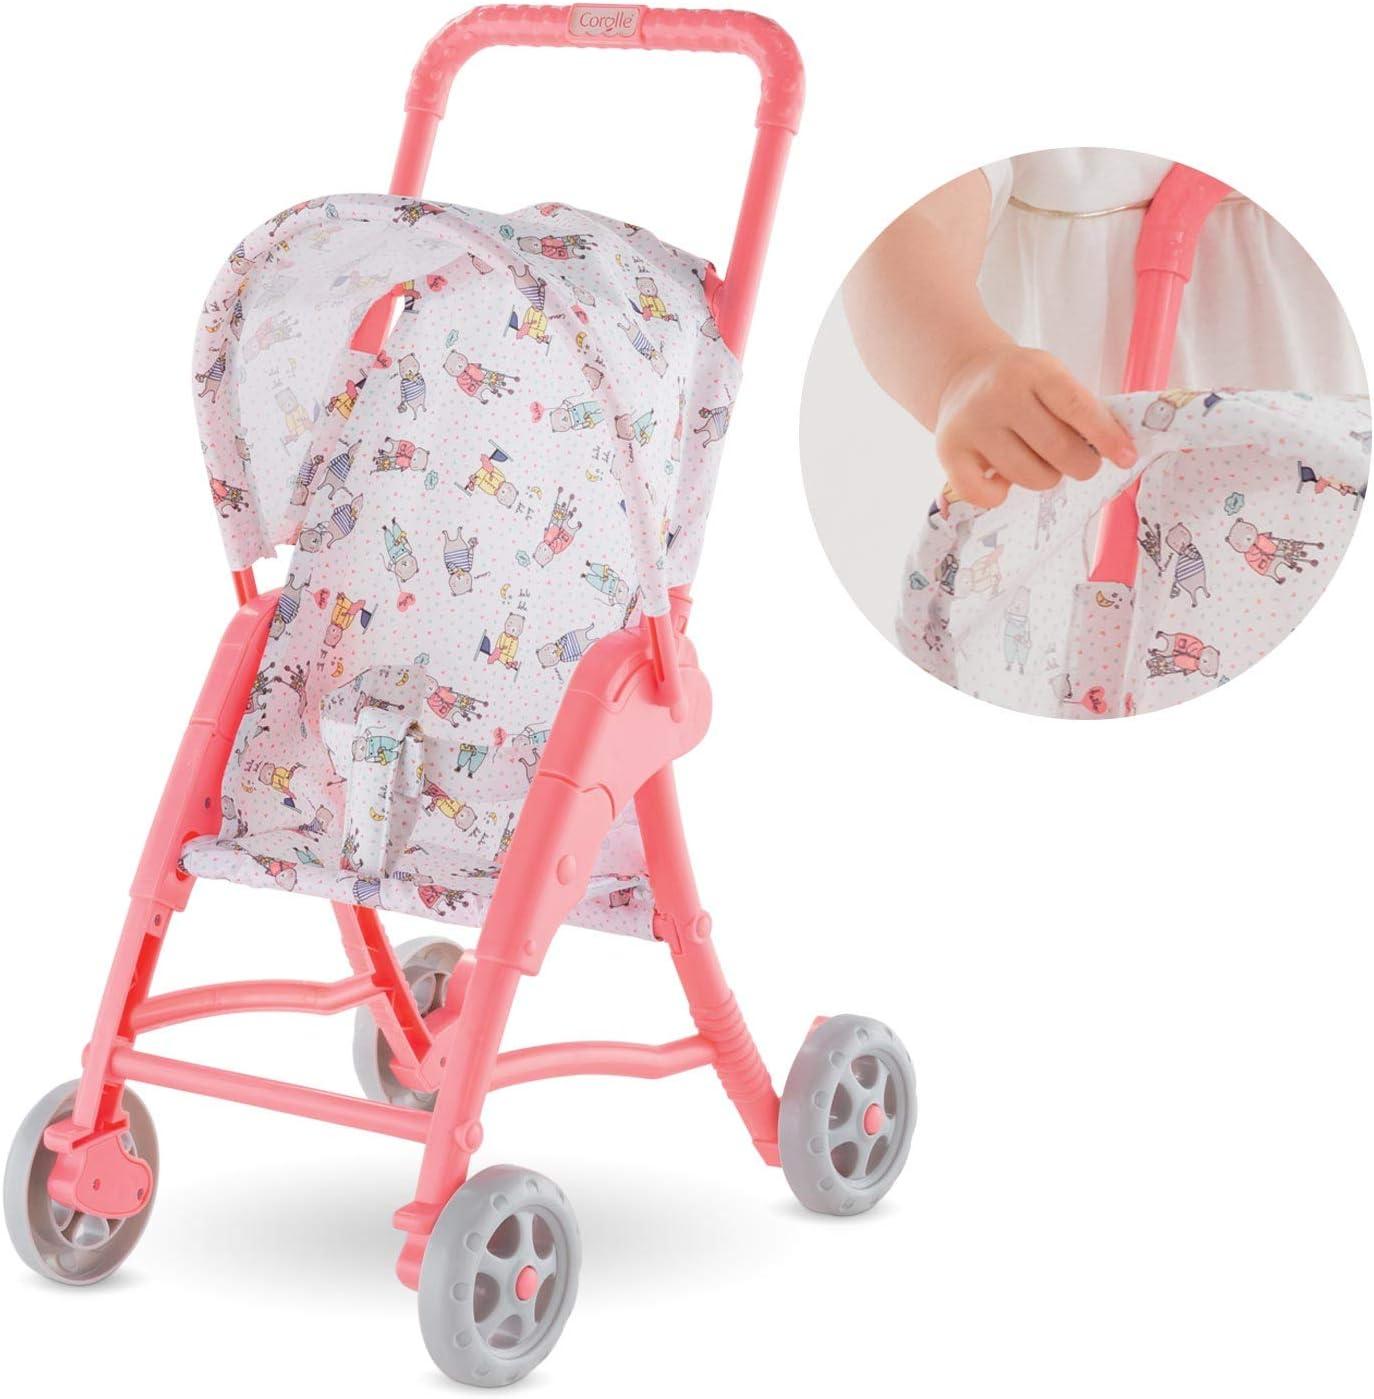 "Corolle - Mon Premier Poupon Stroller for 12"" Baby Dolls"